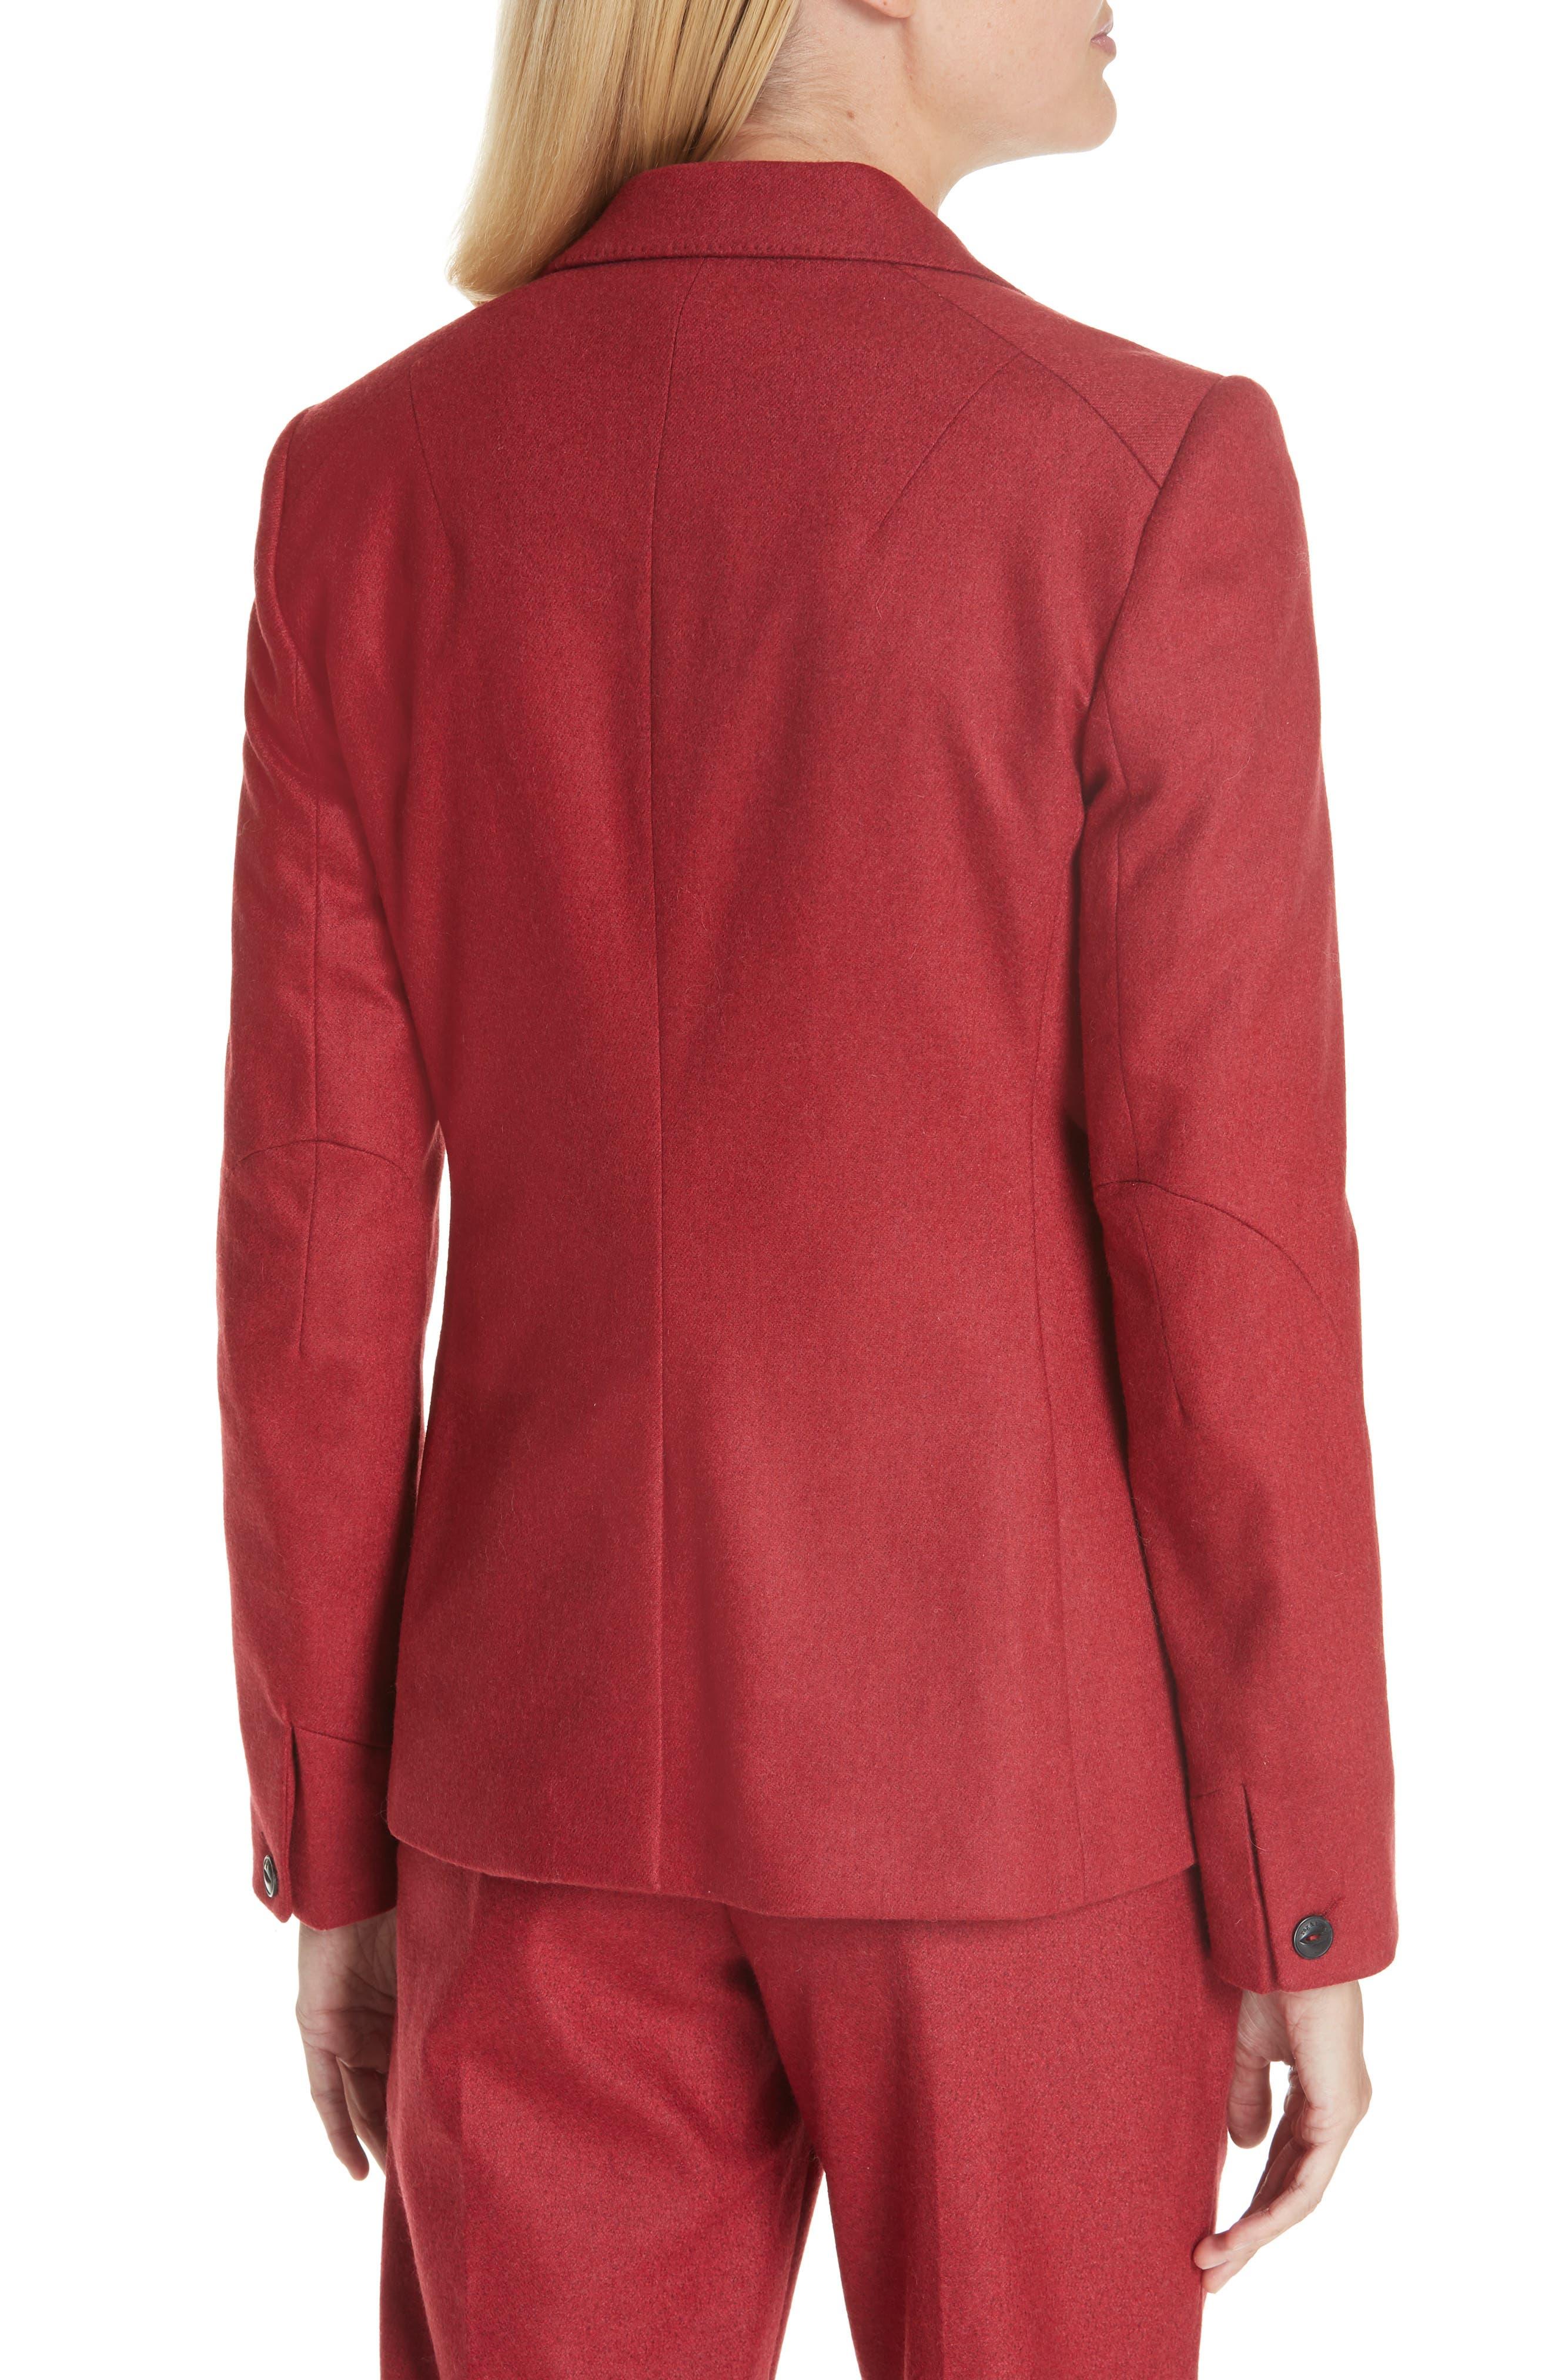 Lexington Wool Blend Blazer,                             Main thumbnail 1, color,                             RED MELANGE